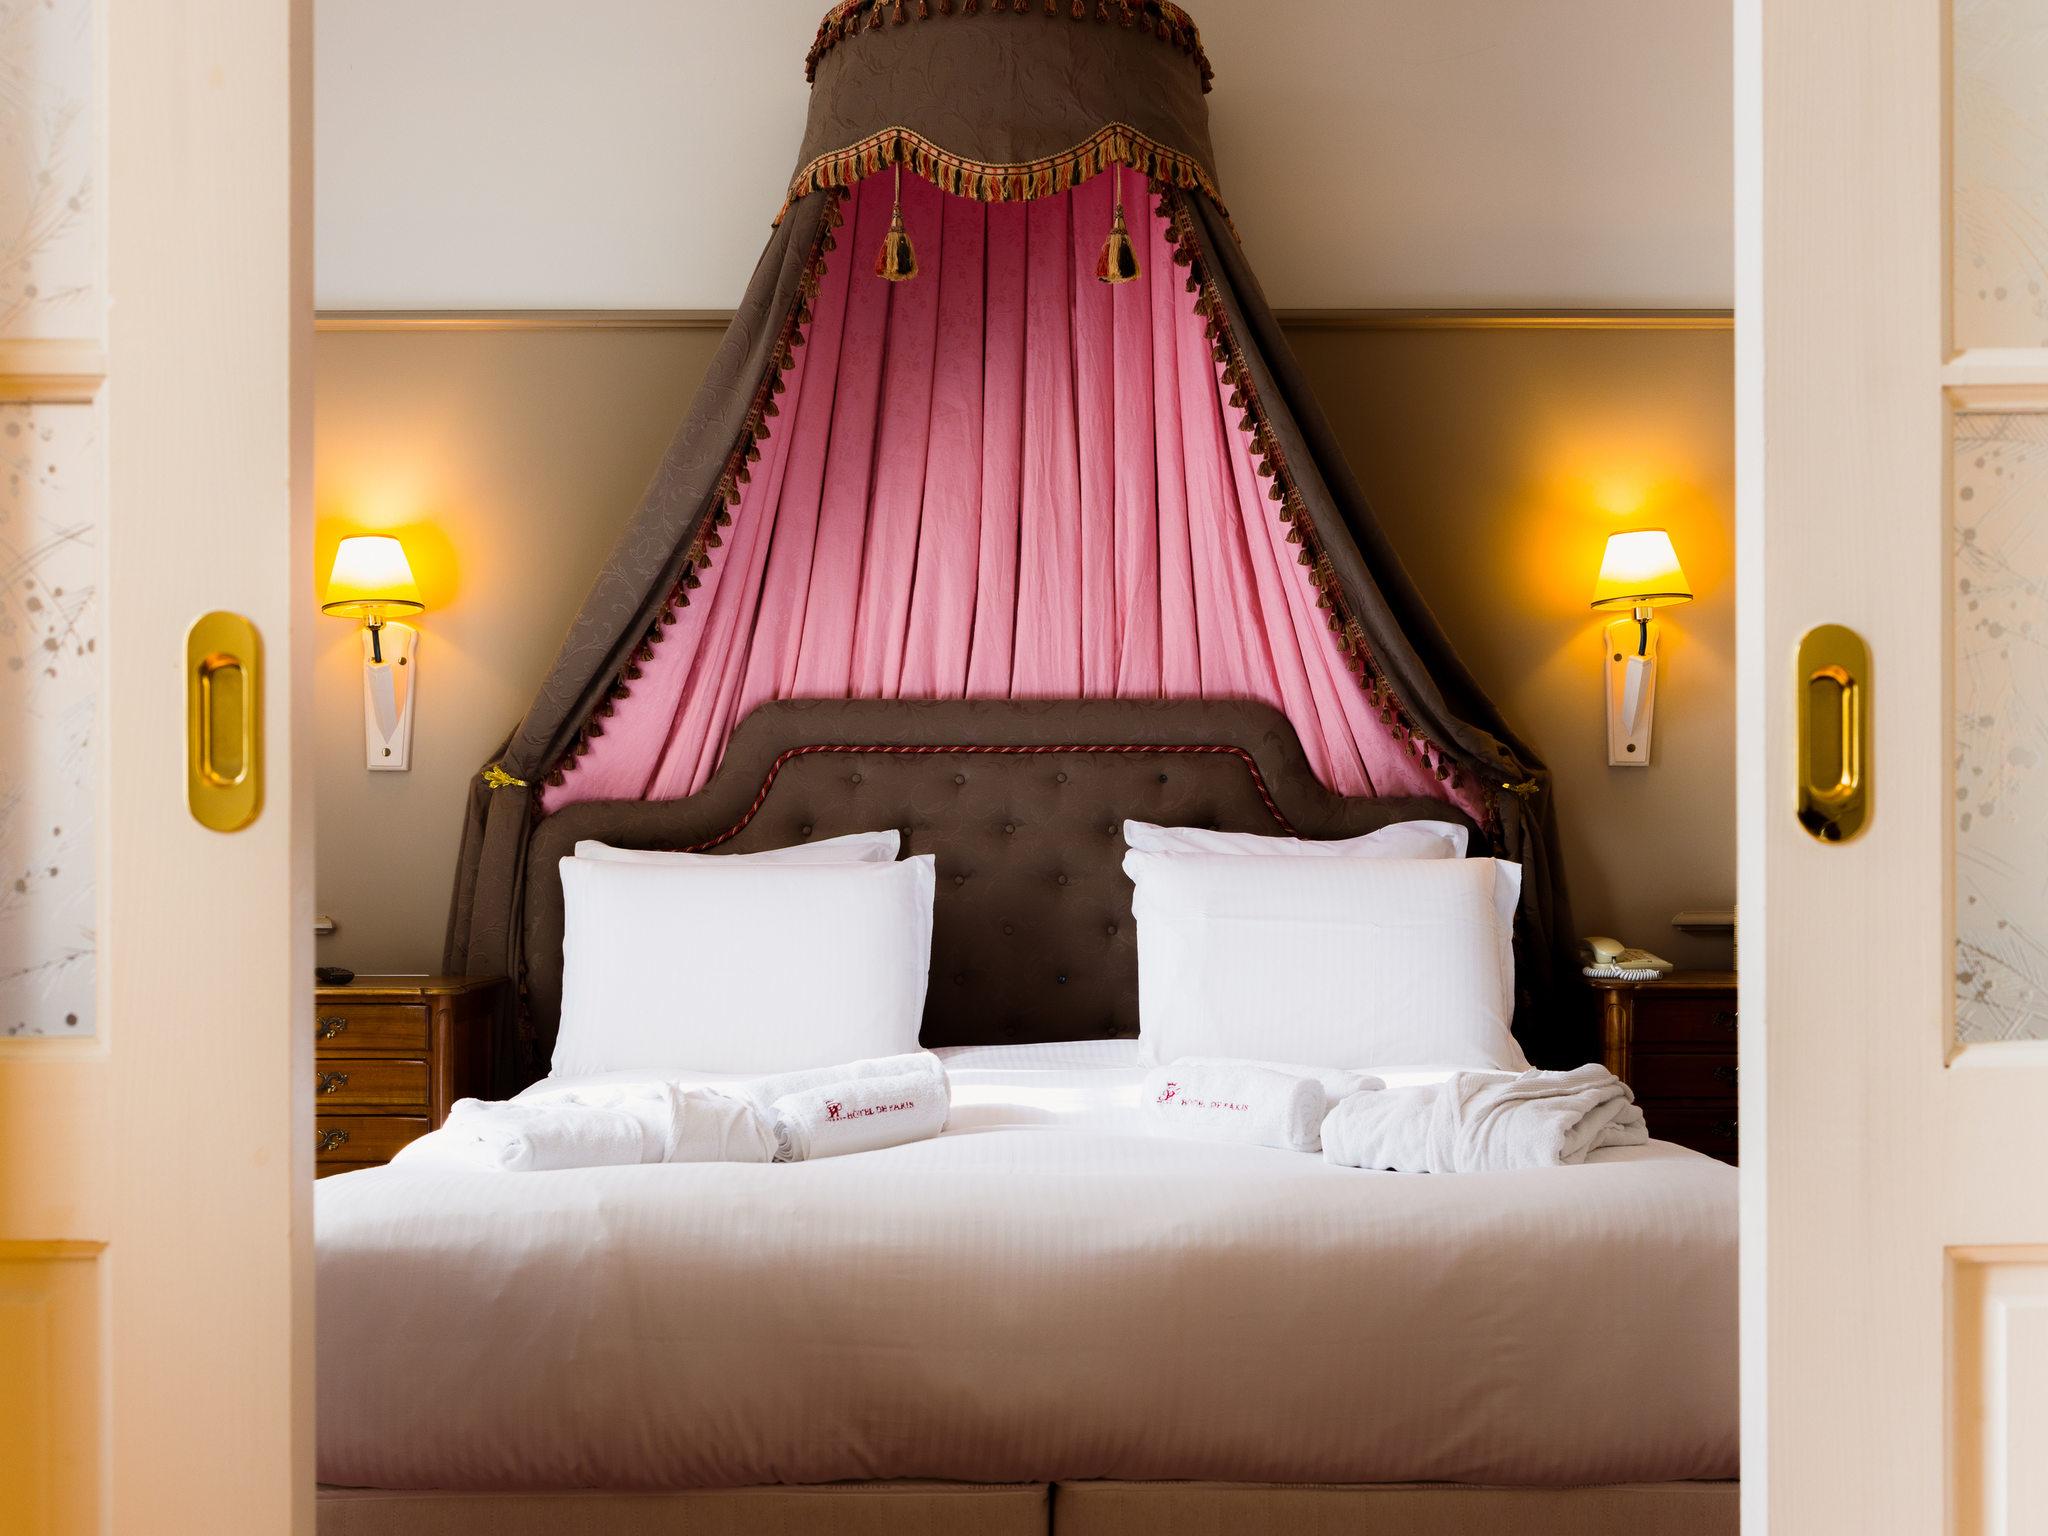 Hotel – Hotel Mercure Moulins Hotel de Paris